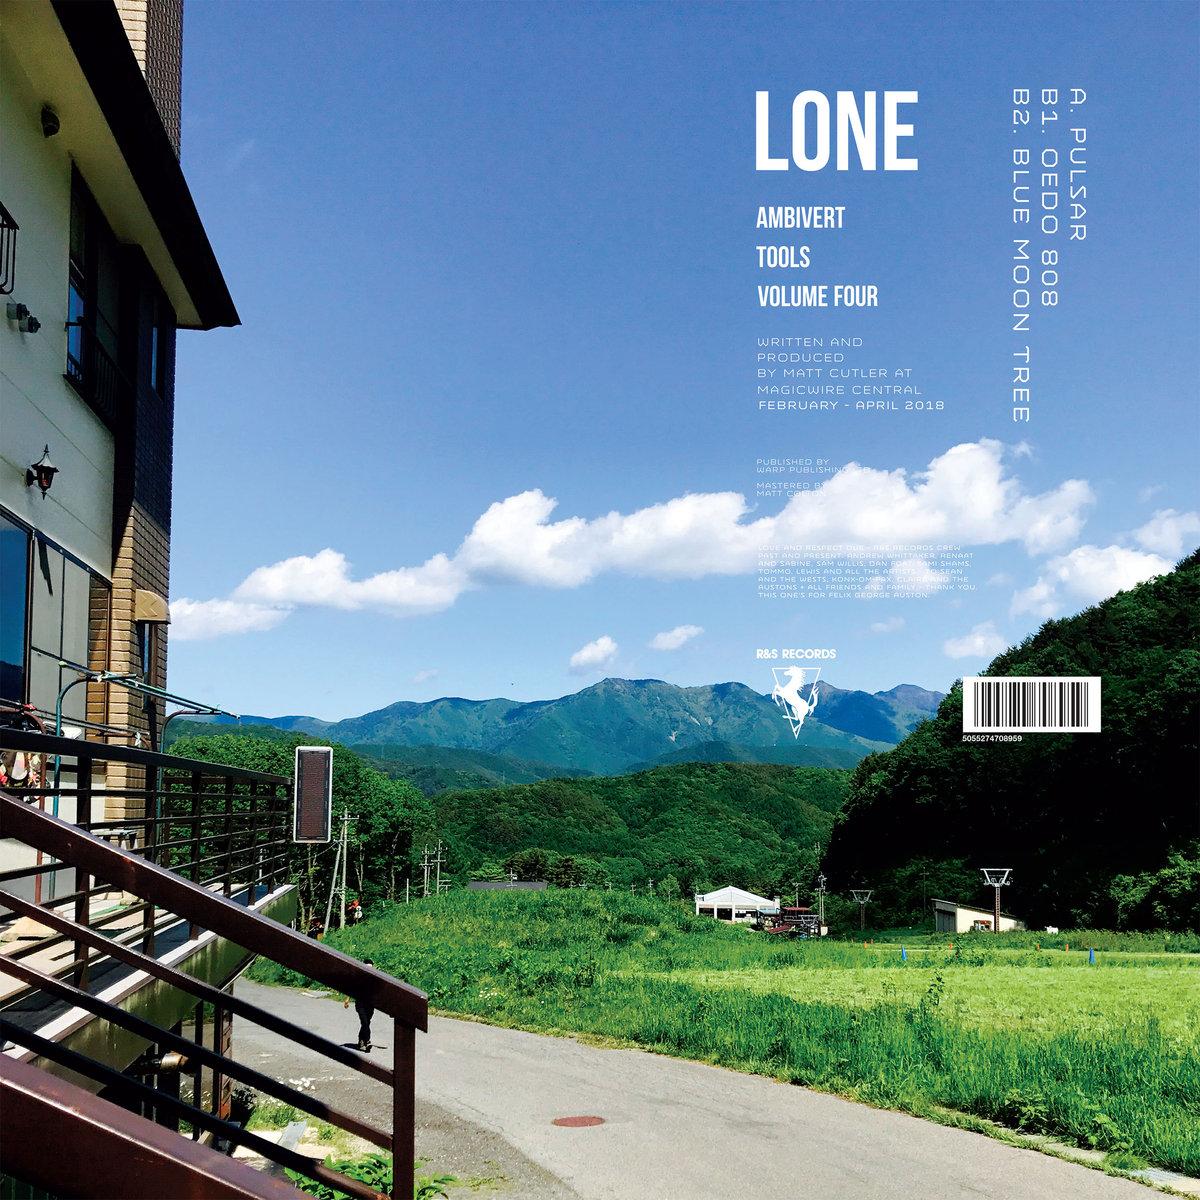 Lone - Ambivert Tools Vol. 4